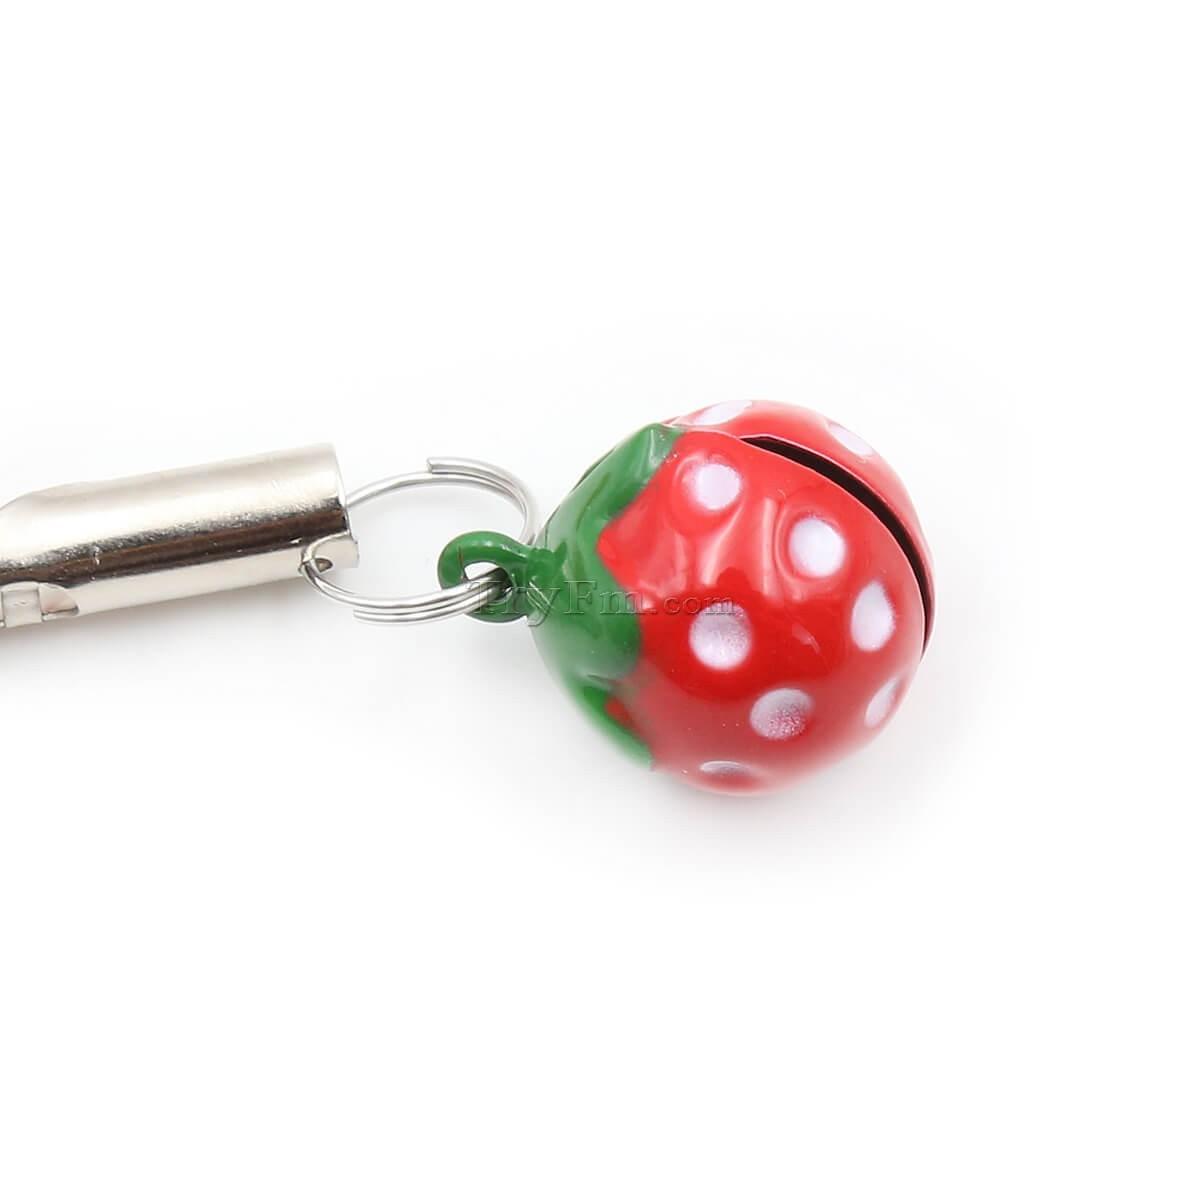 1-red-cherry-nipple-clamp4.jpg